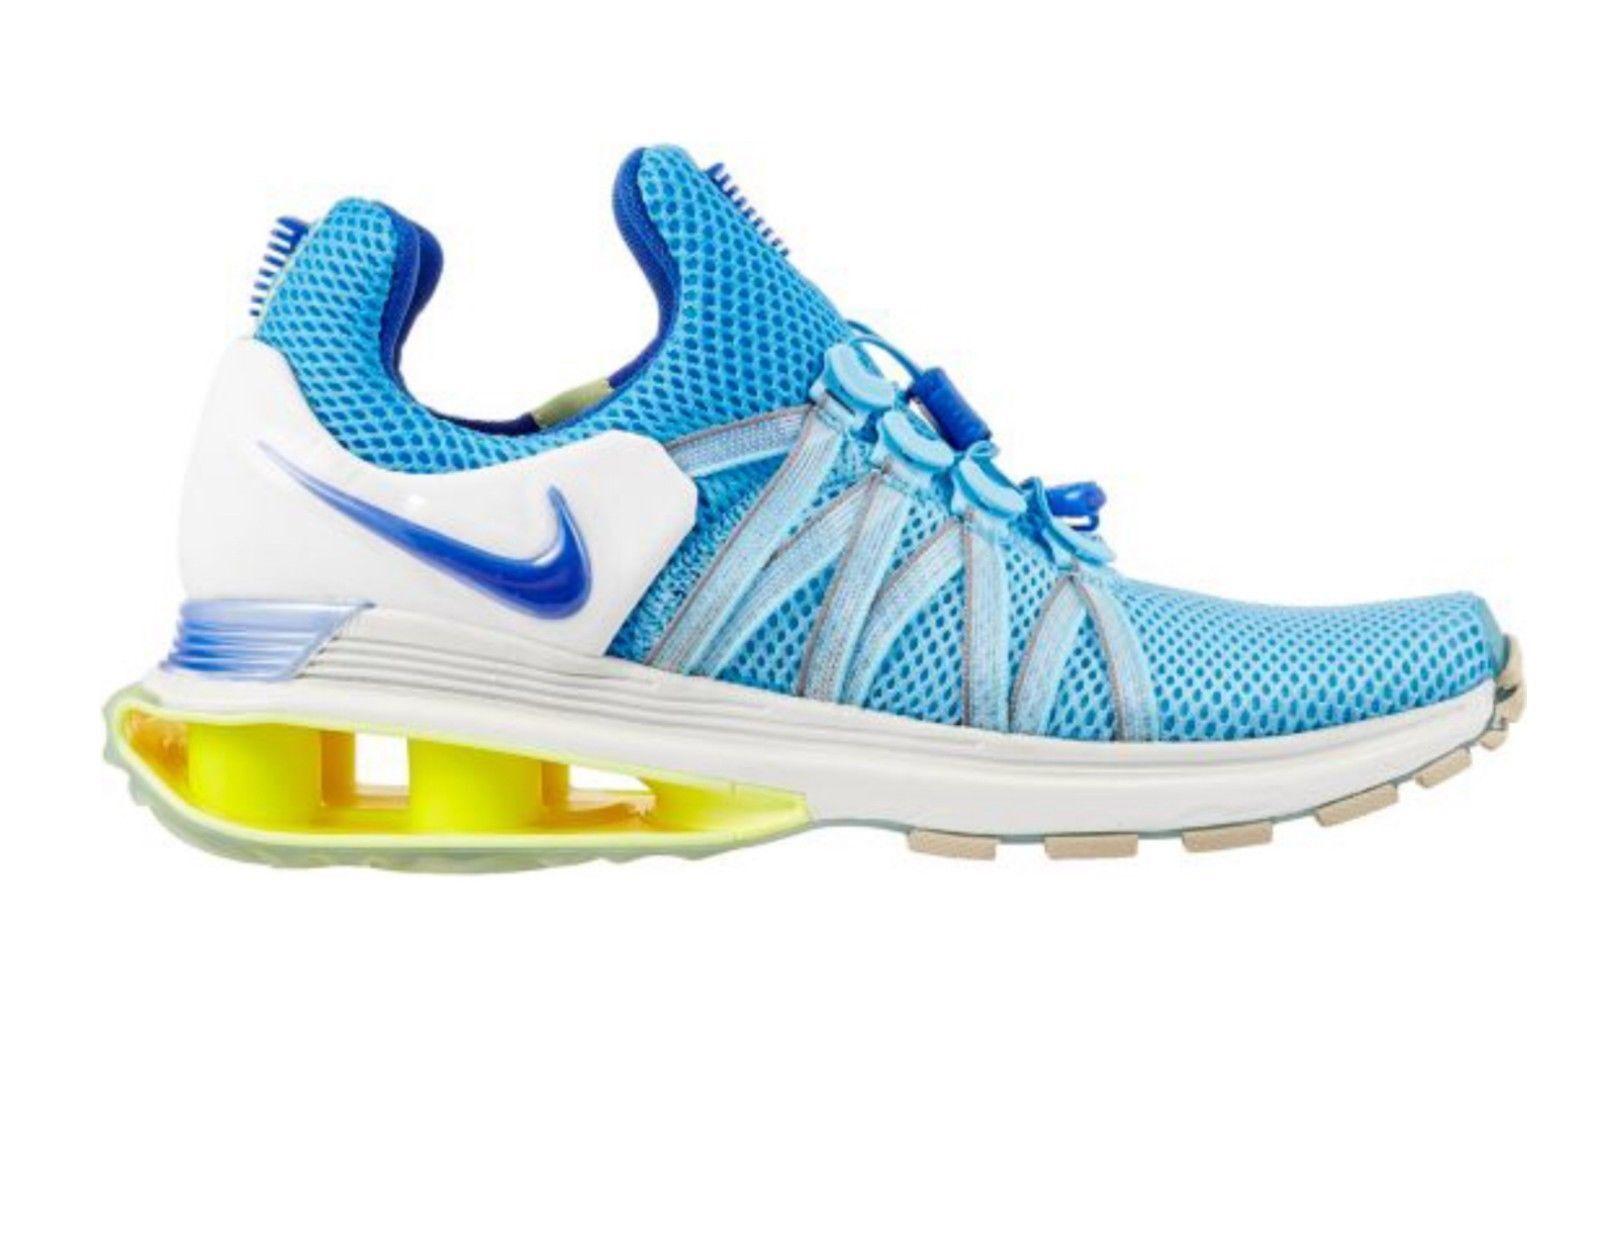 sports shoes 45305 b4415 ... promo code for 150 nwt femmes nike shox gravity run chaussures aq8554  404 sequent torch reax